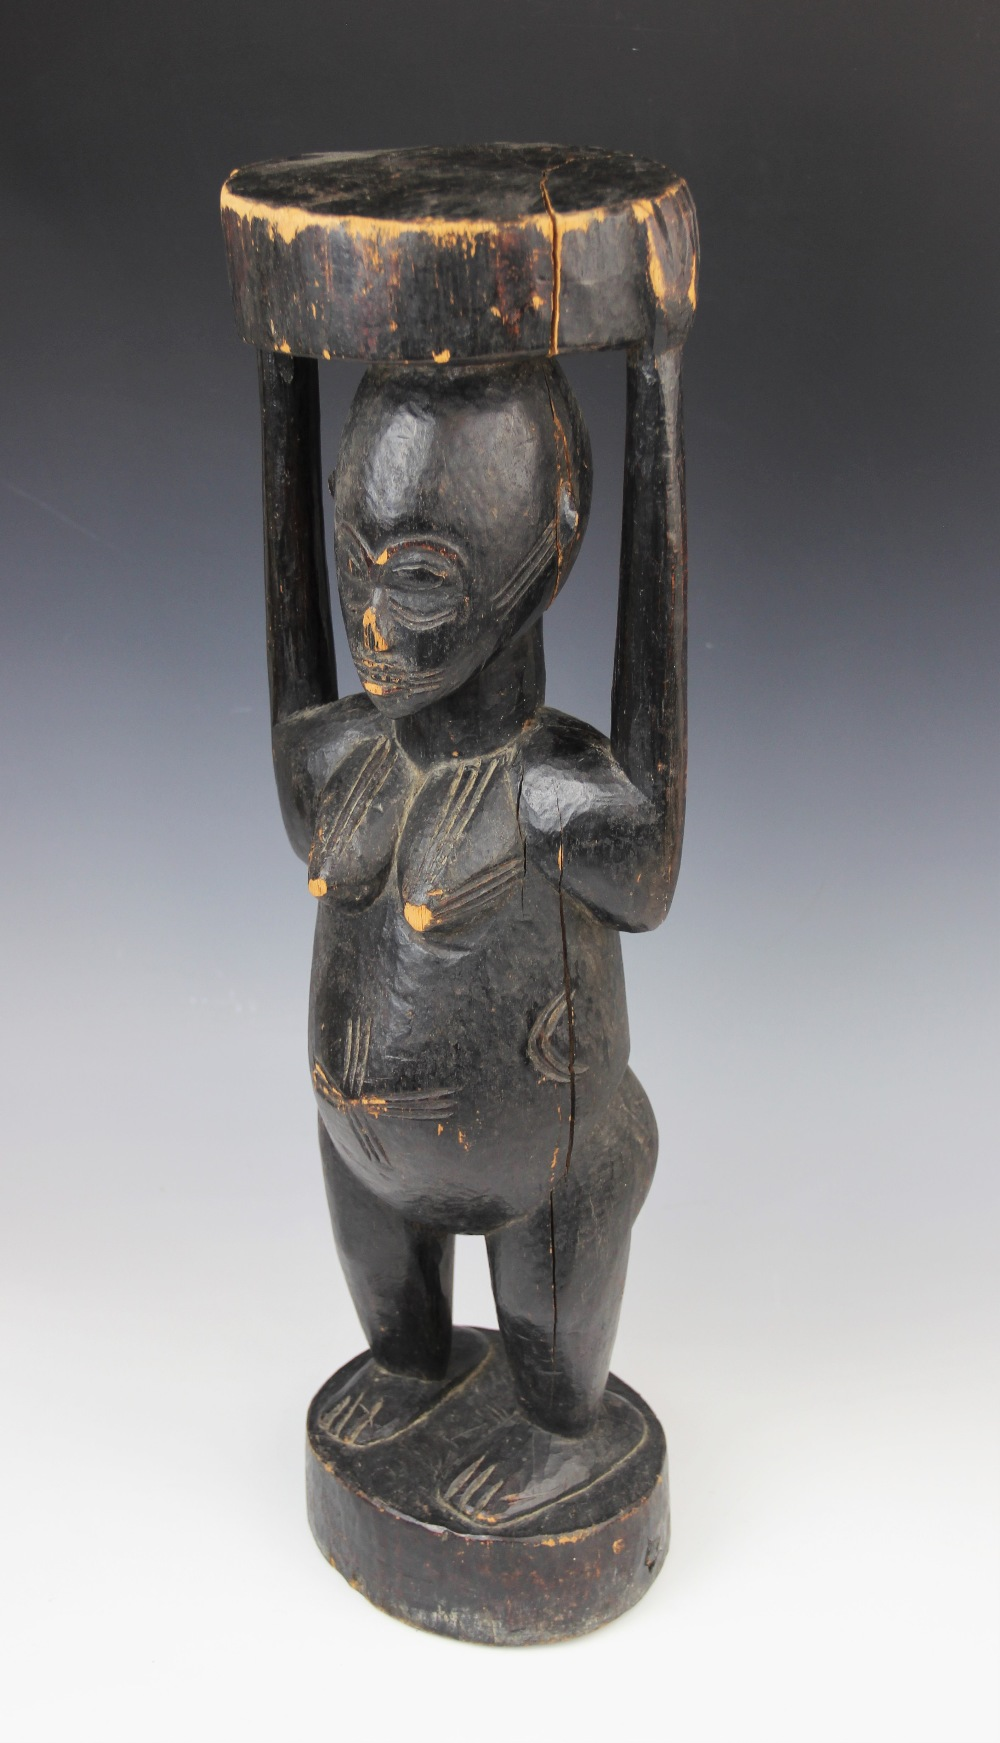 A large West African Senufo Ivory Coast female figure, 56cm high